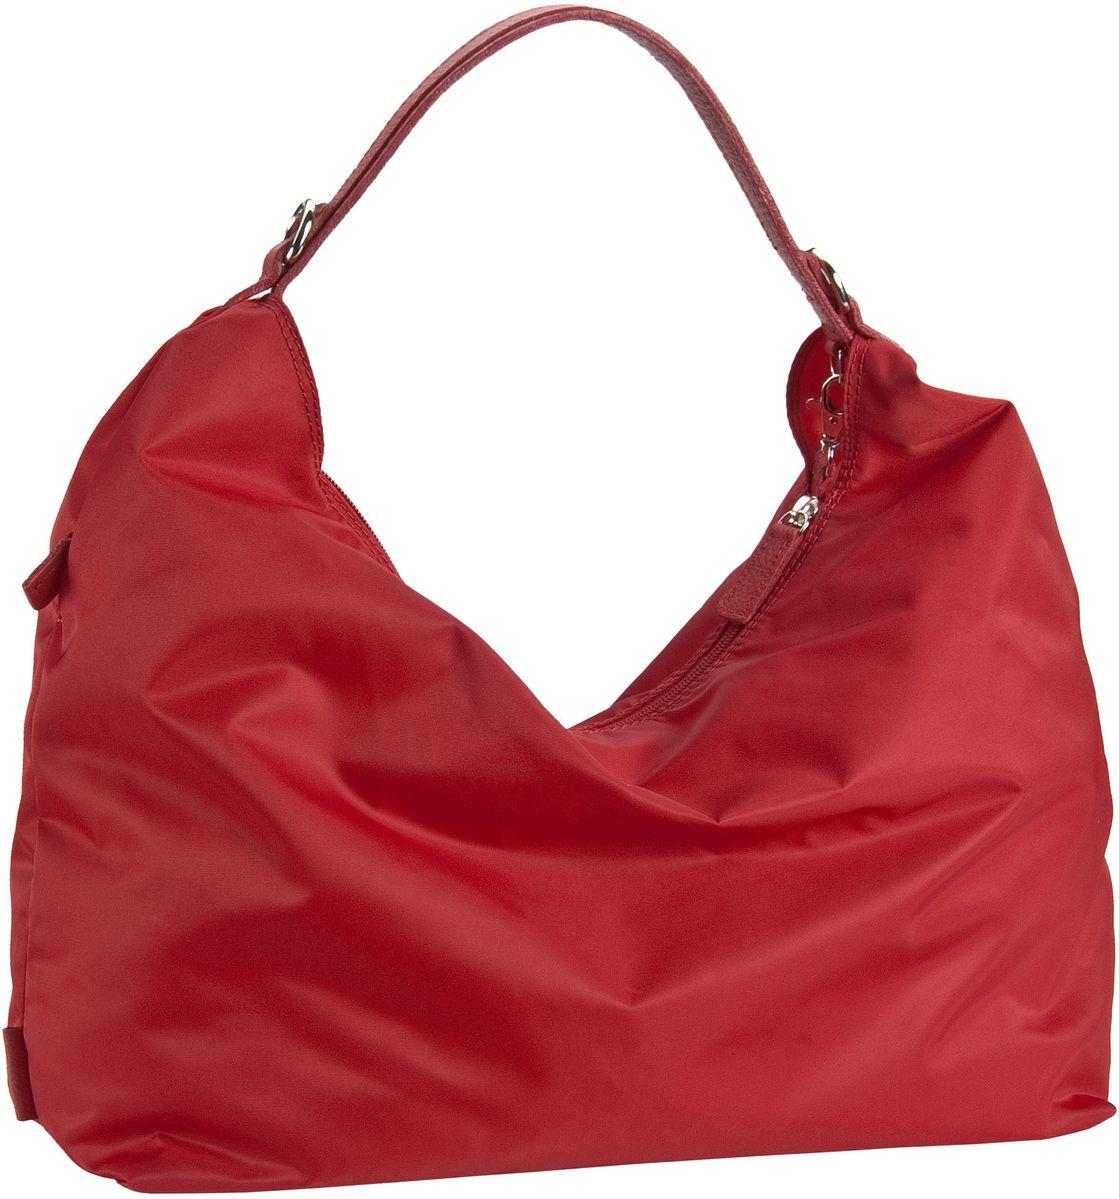 Jost Handtasche Tofino 1998 Reißverschluss-Handtasche Seal Red - Beuteltasche / Hobo Bag, Handtaschen